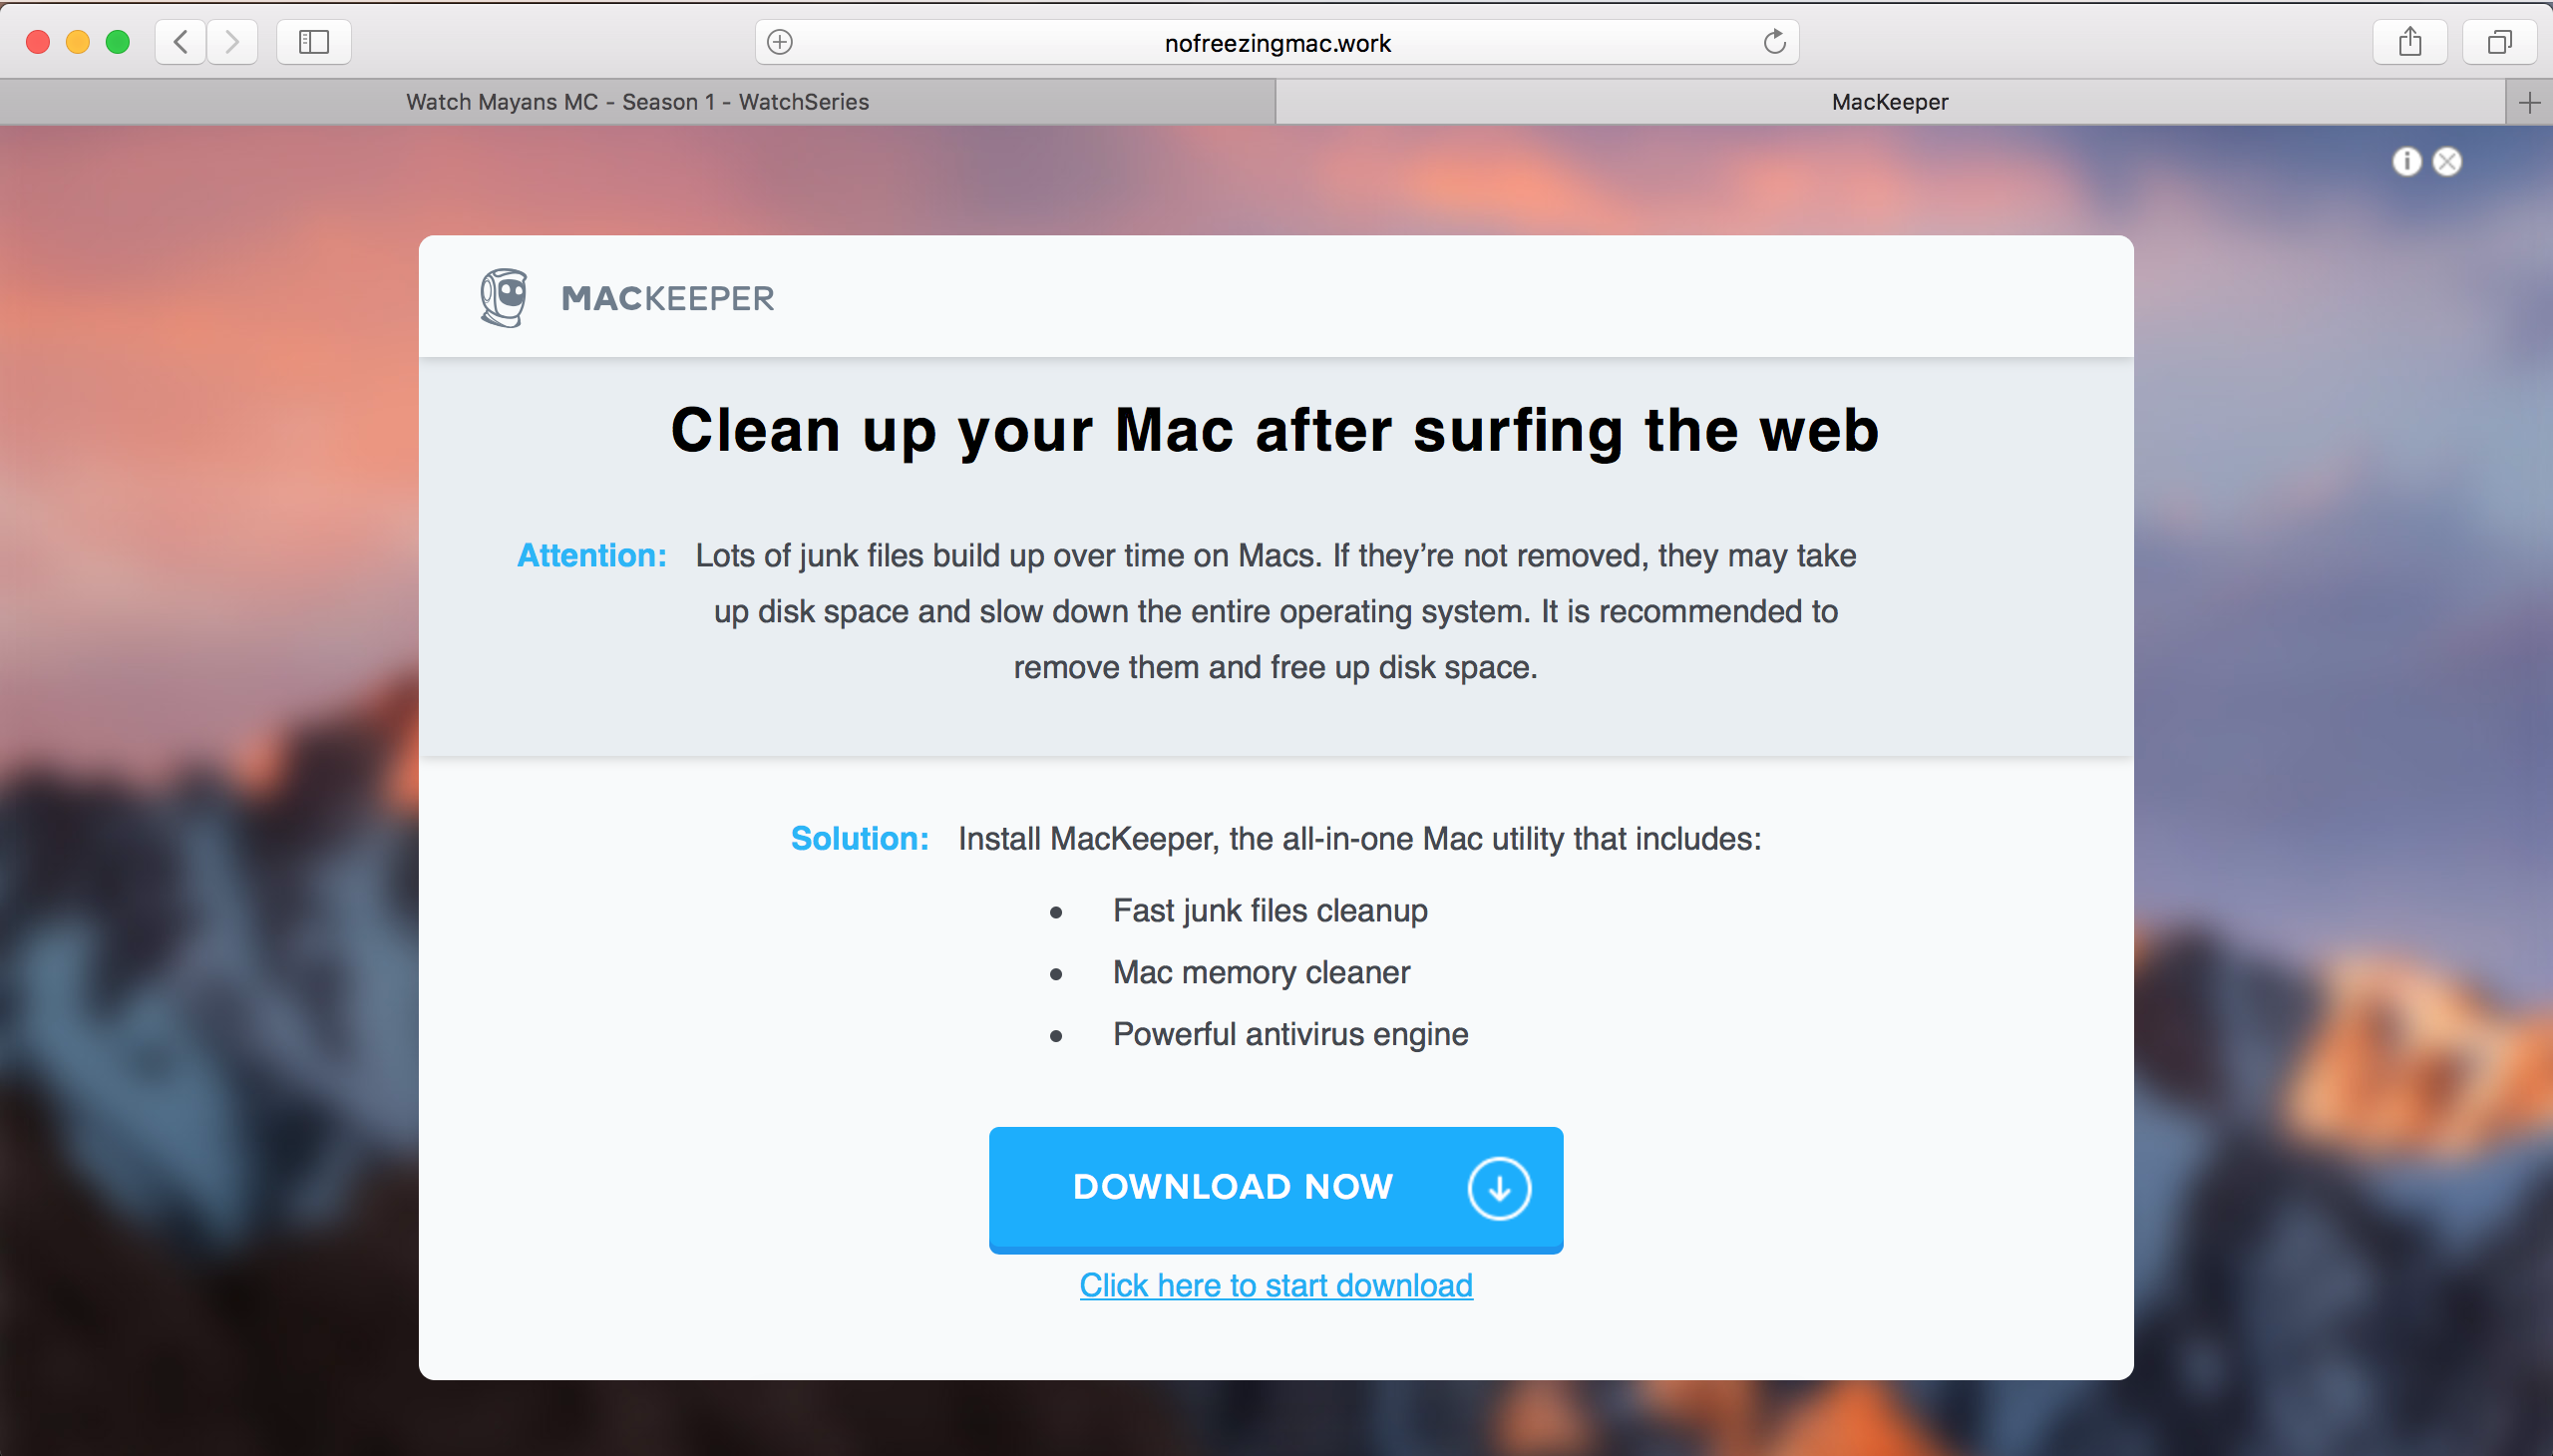 mackeeper keylogger